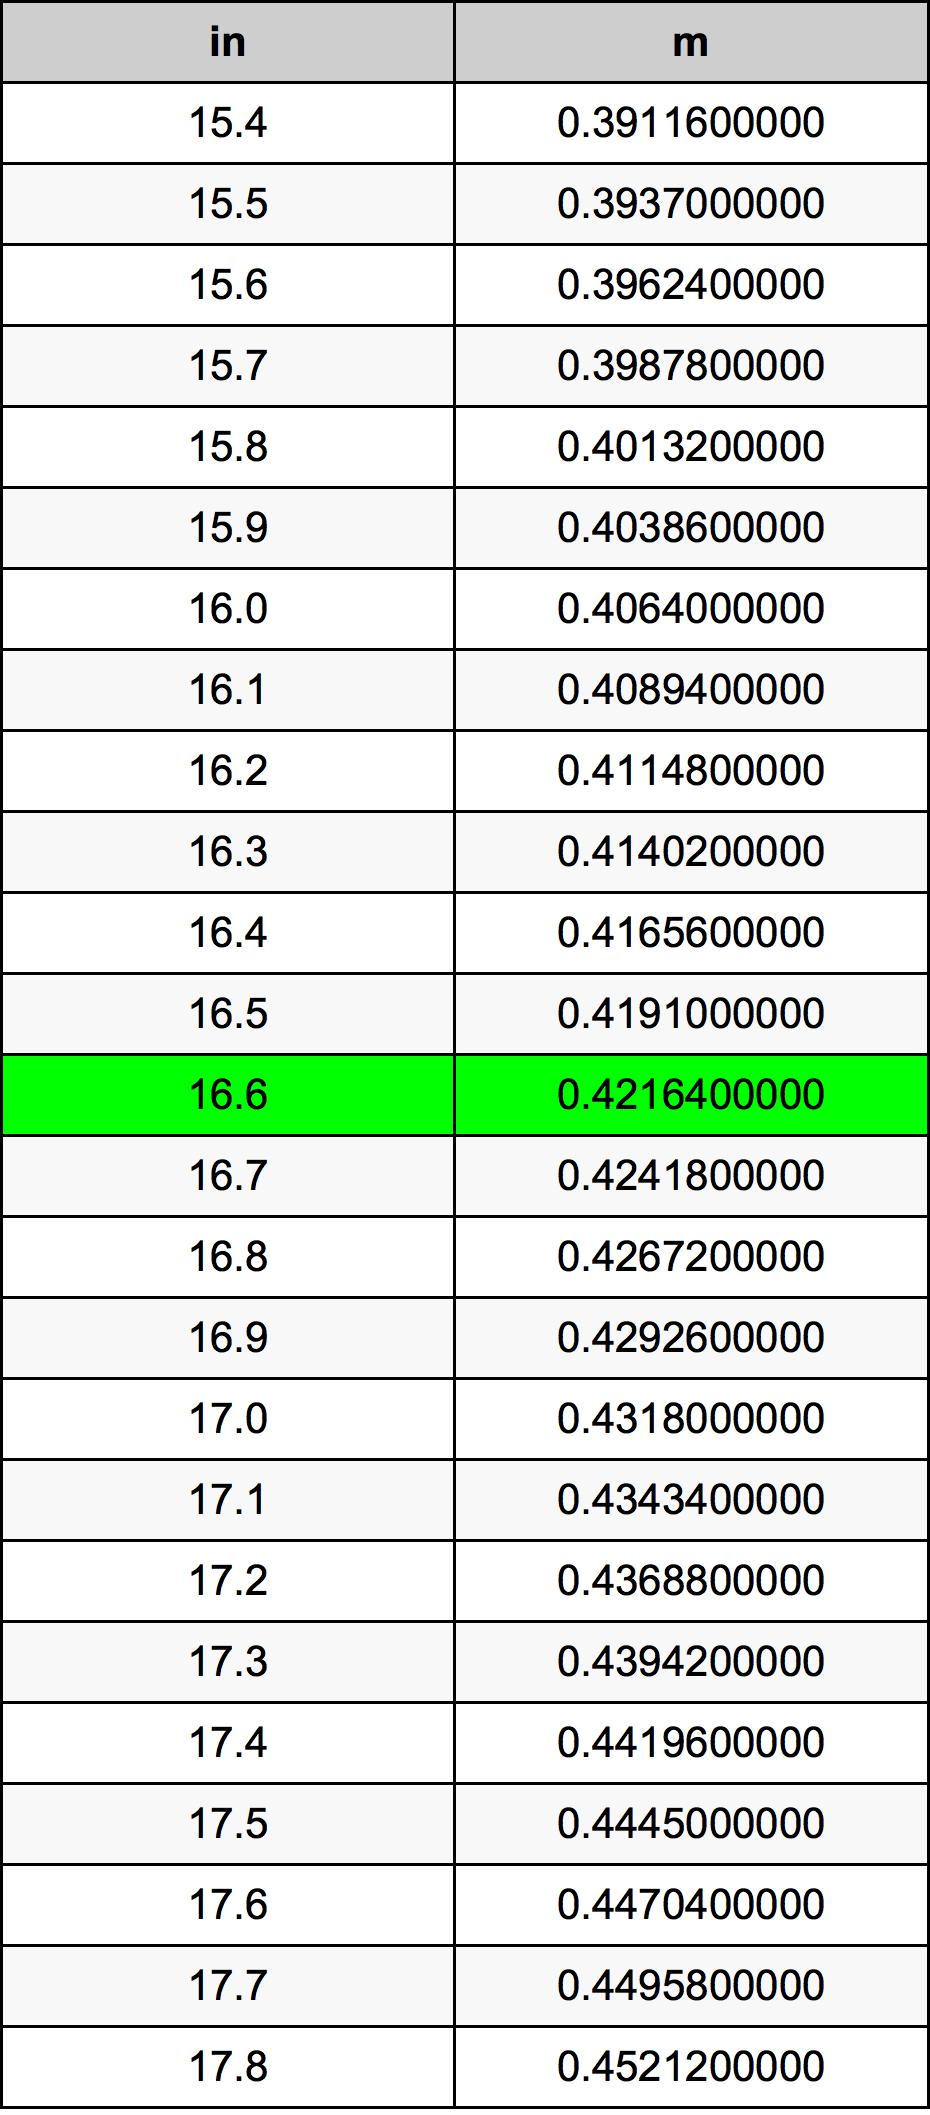 16.6 Inci konversi tabel